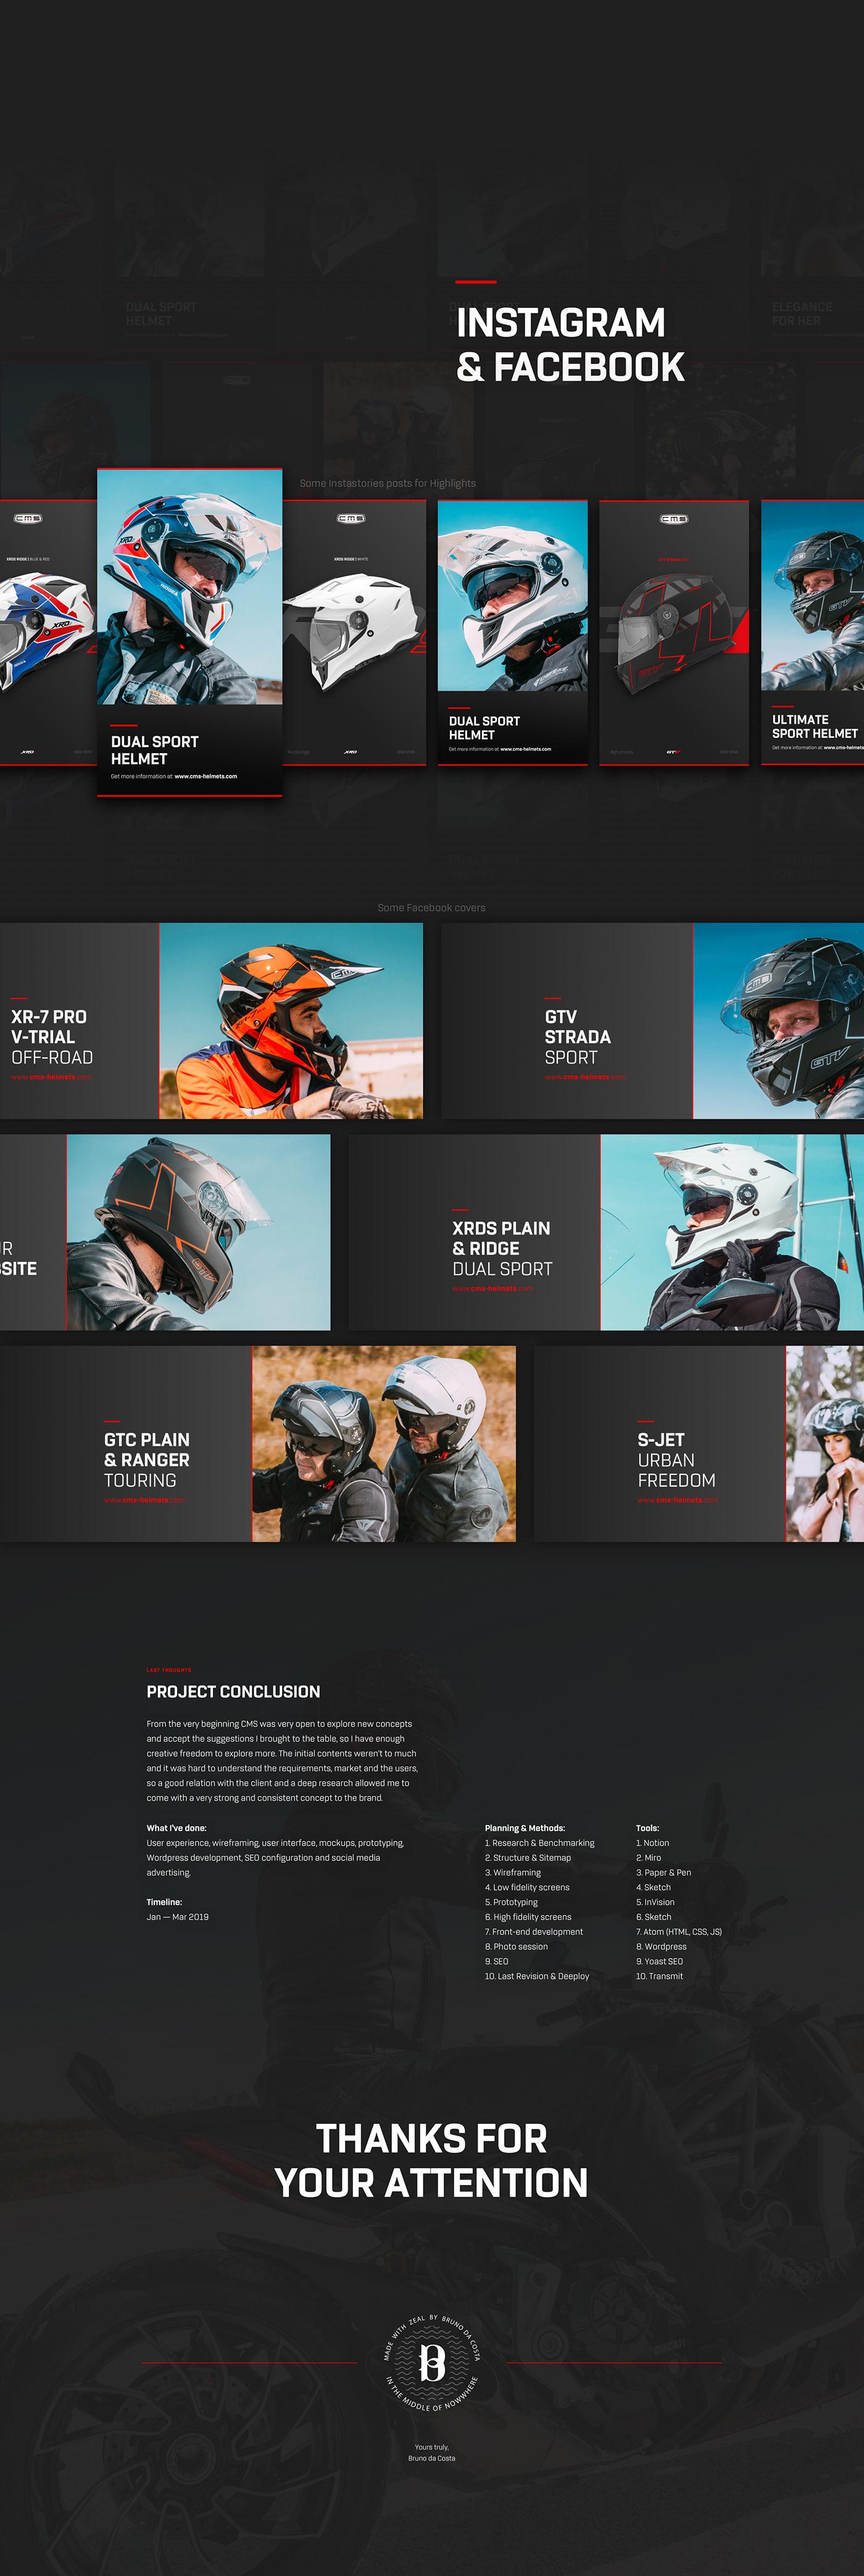 Web Design  UI&UX   UI/UX ui design UX design motorcycles helmets art direction  branding  Creative Direction